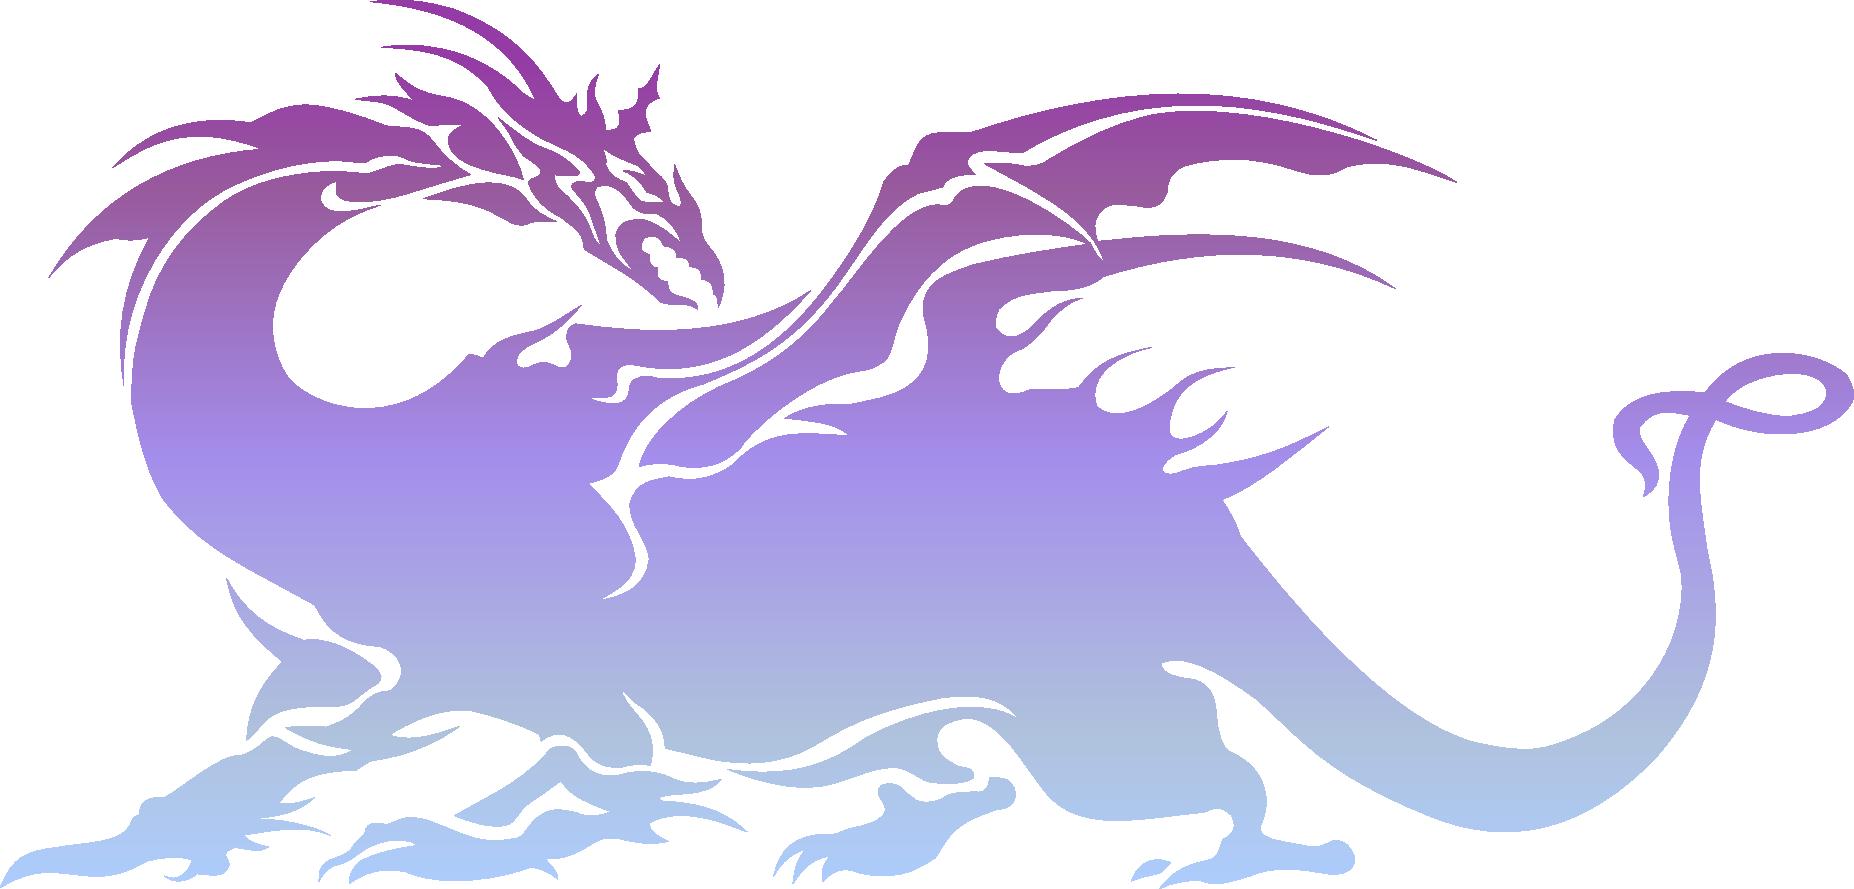 Final fantasy xii logo png - photo#31